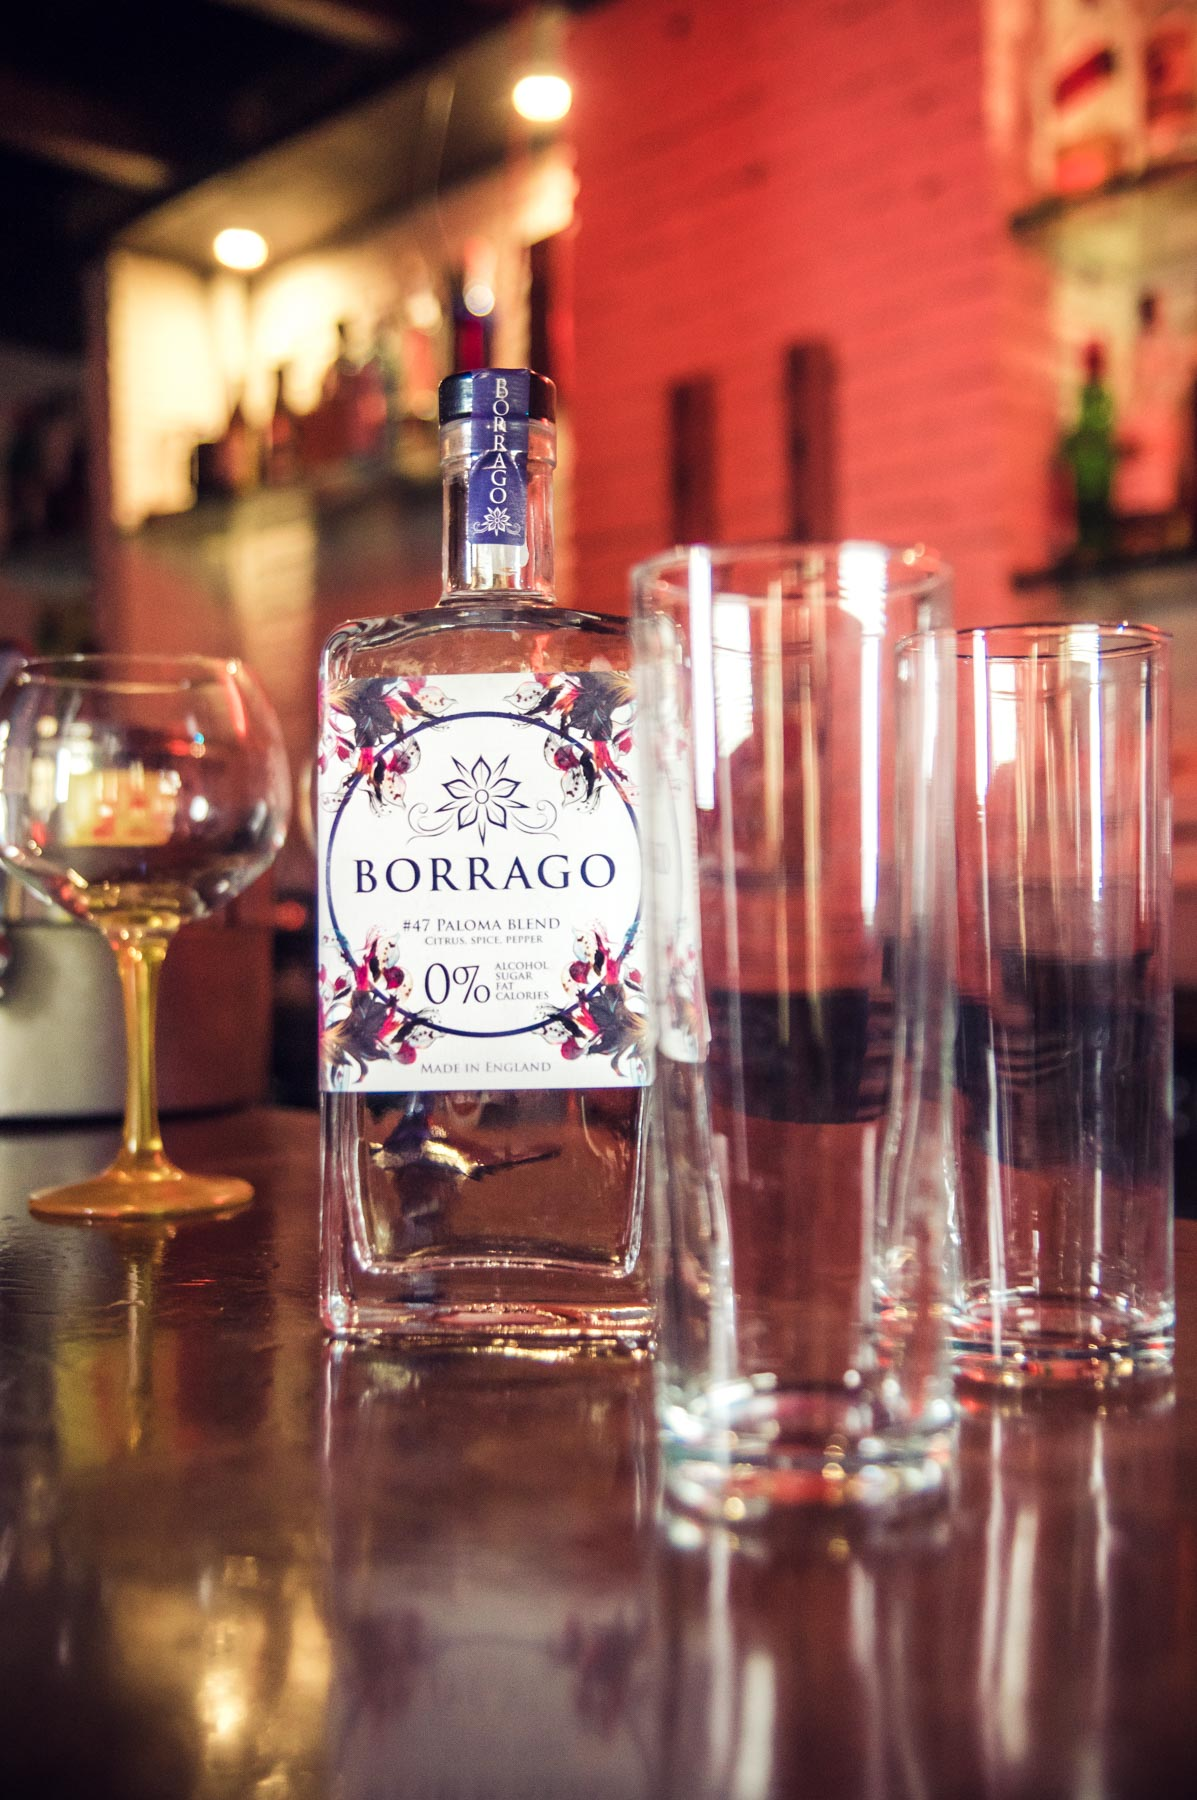 Borrago alcohol free